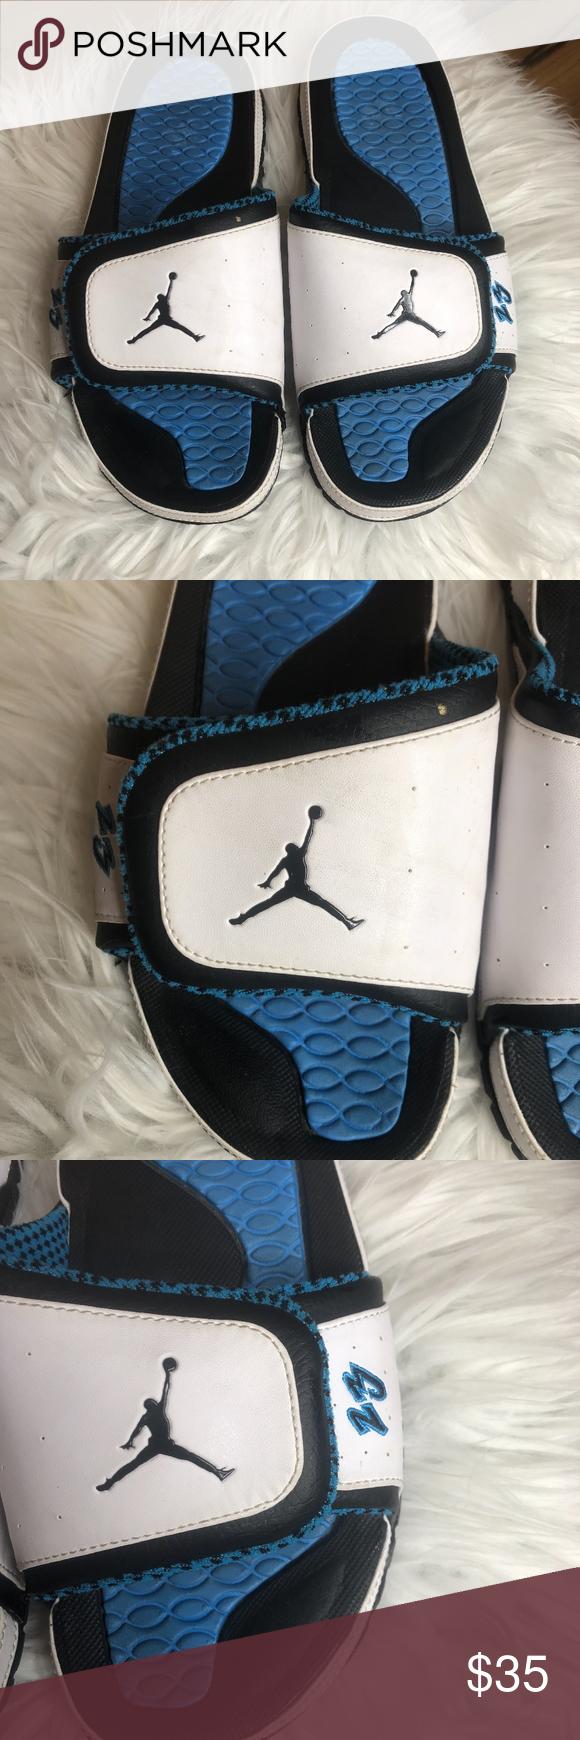 bde43dcae7dd Air Jordan Slides White and Blue Men s 8 size 8 in mens